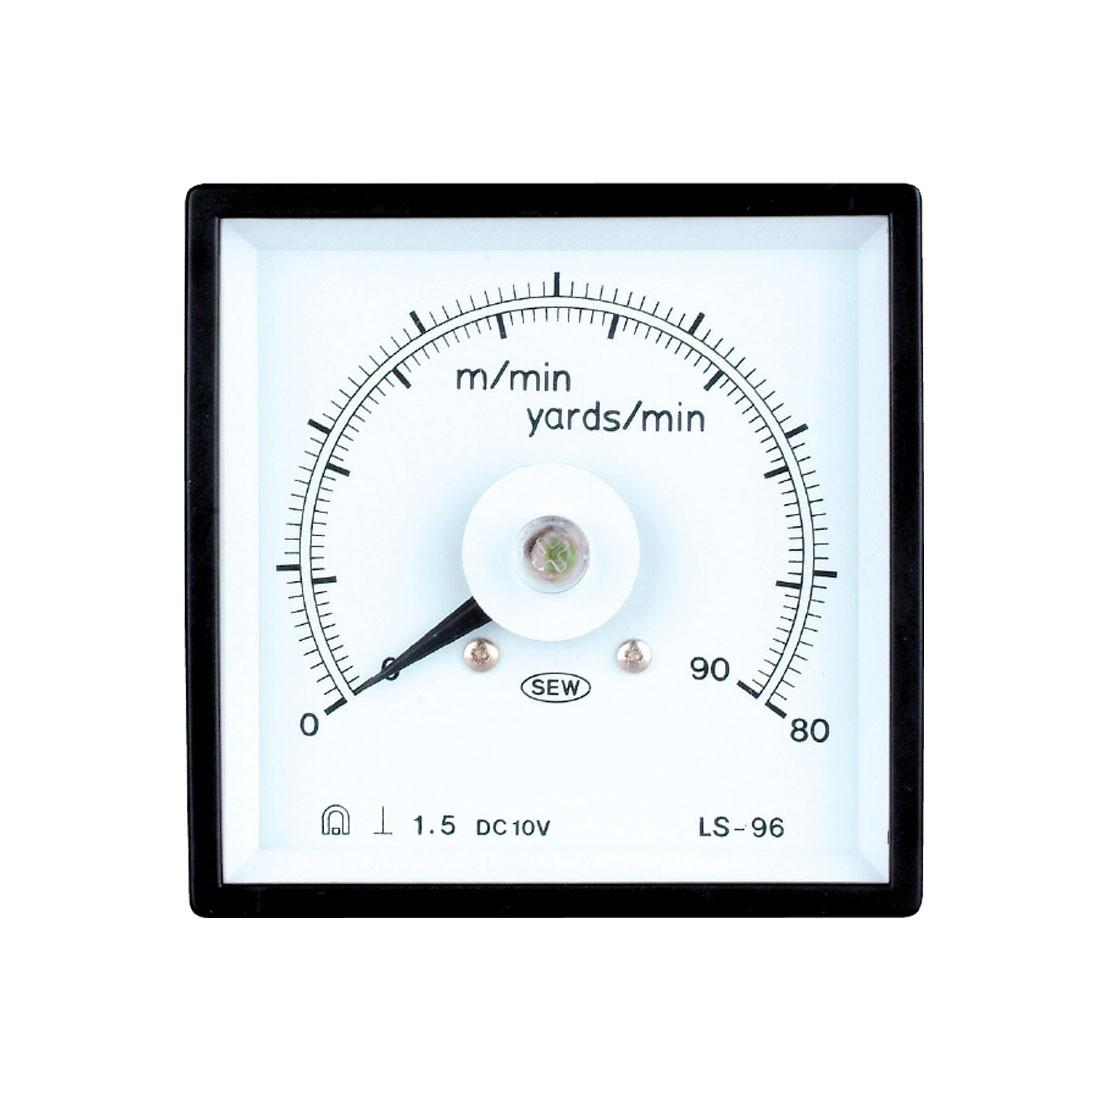 HLS-96 DC and AC Analog Panel Meter